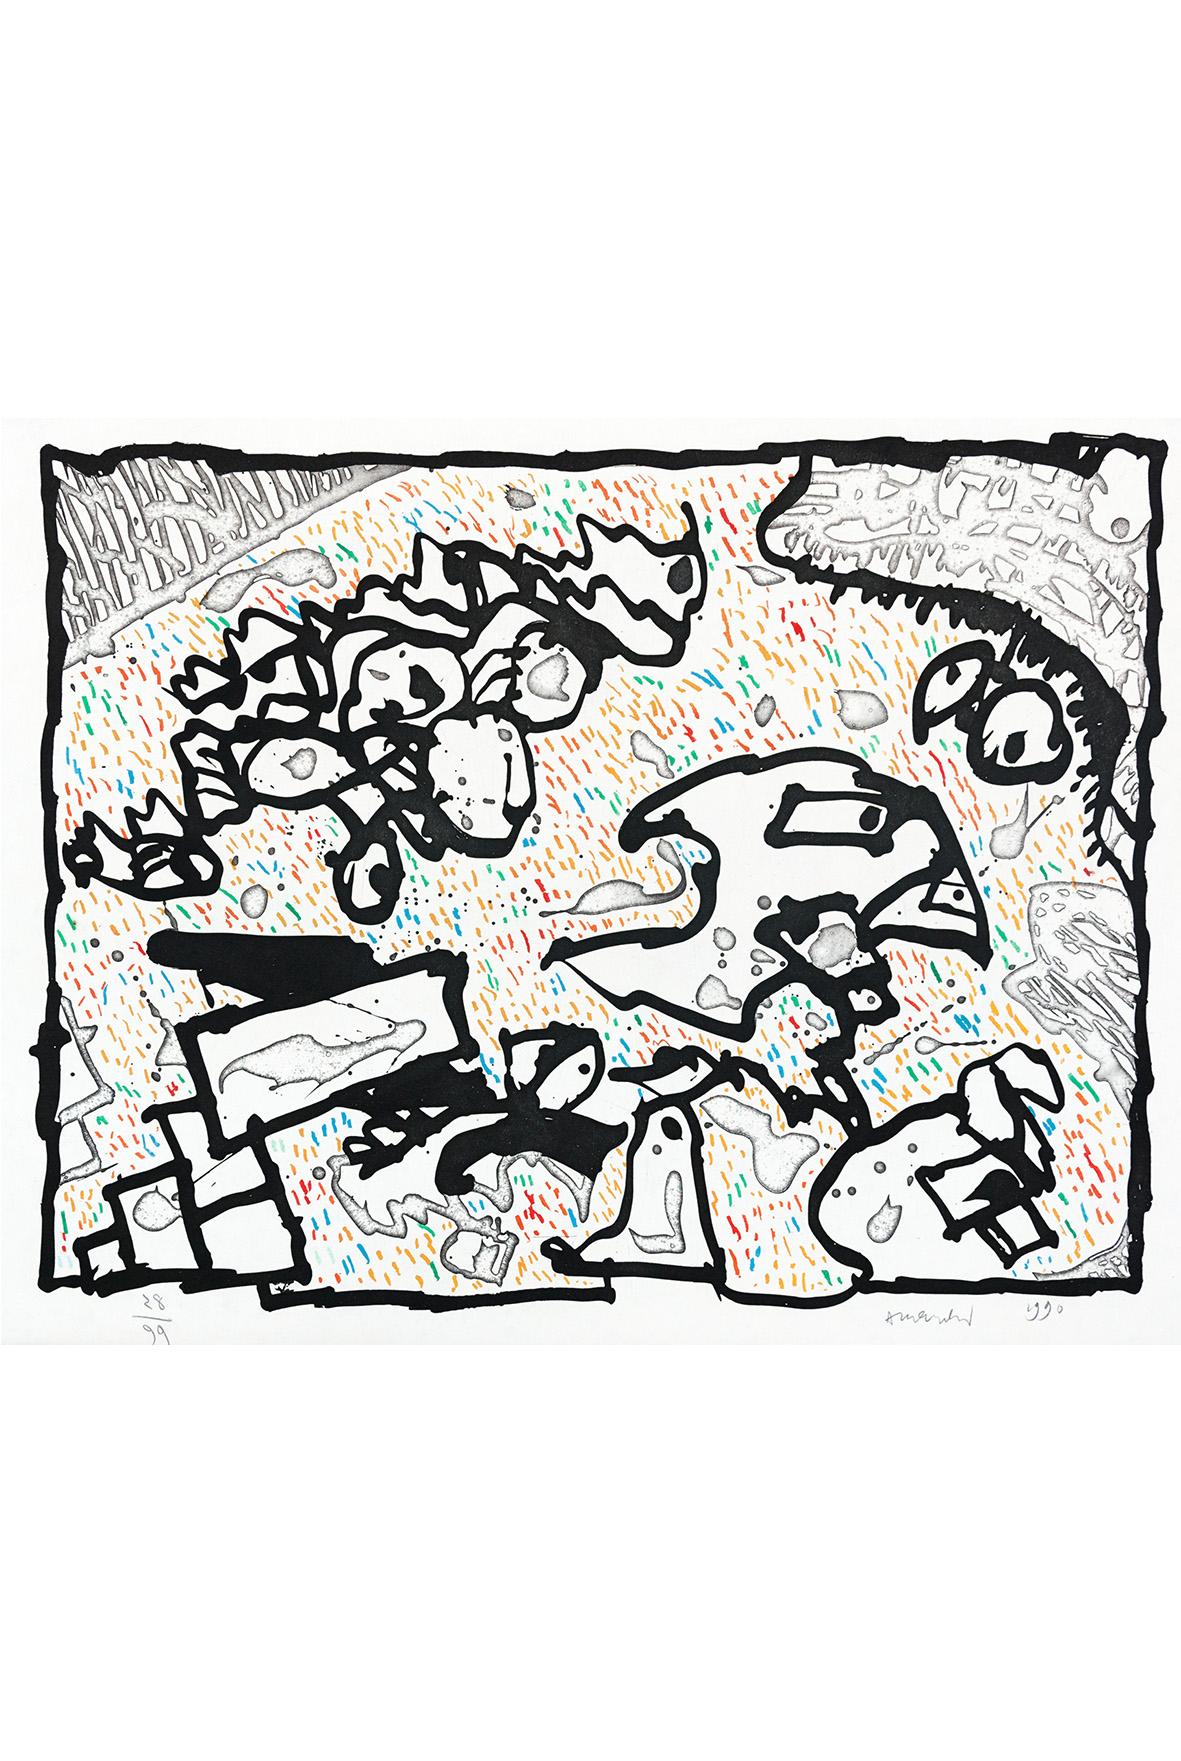 Alechinsky - Galerie Pome Turbil dedans Oeuvre Alechinsky